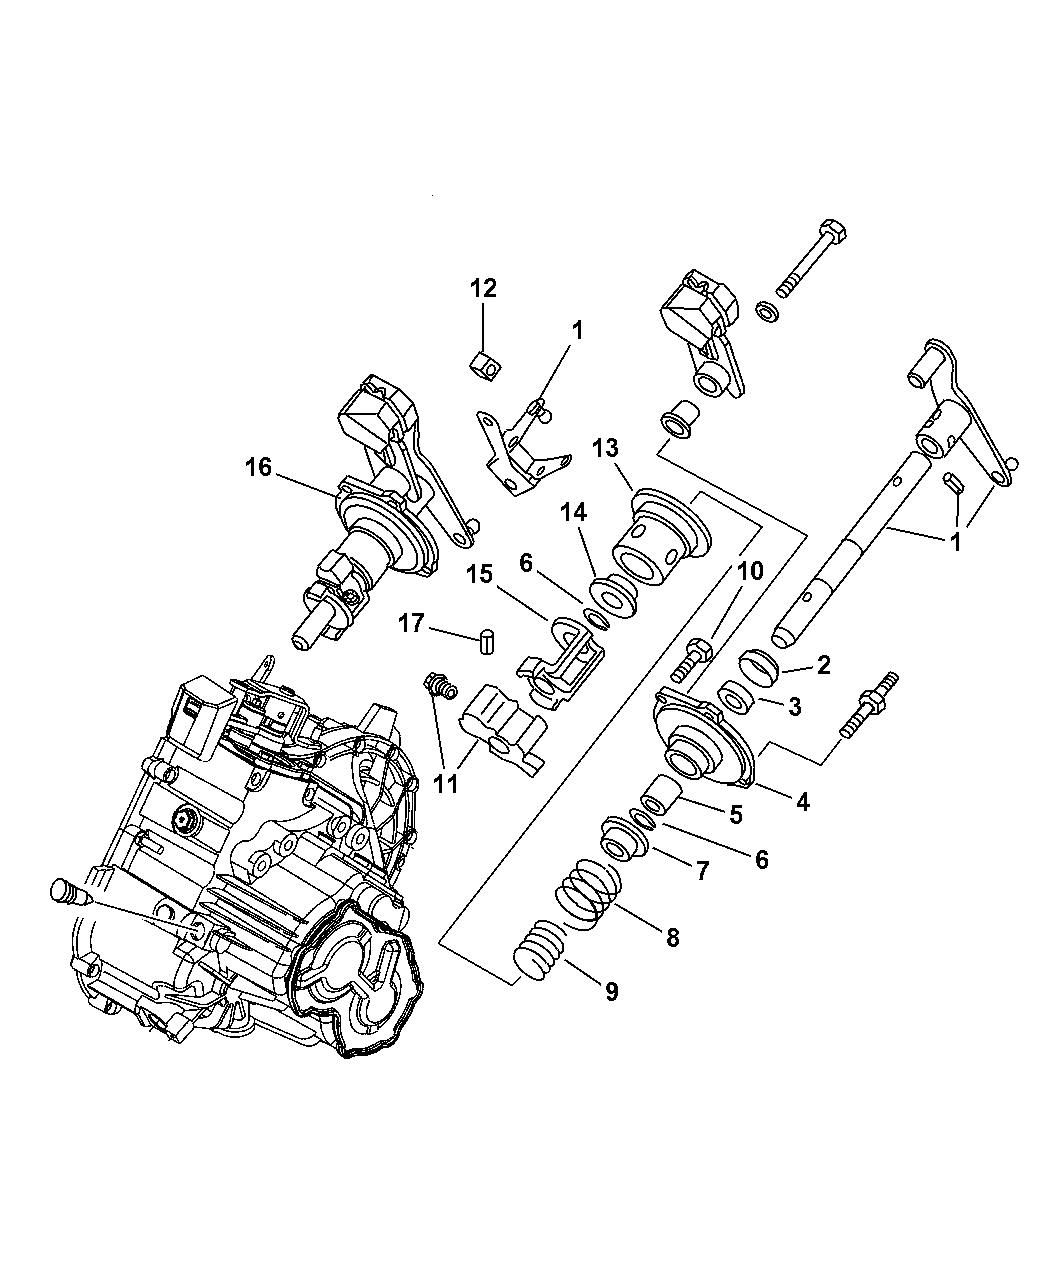 2009 Chrysler Pt Cruiser Shift Fork Rails Mopar Parts Giant Engine Diagram